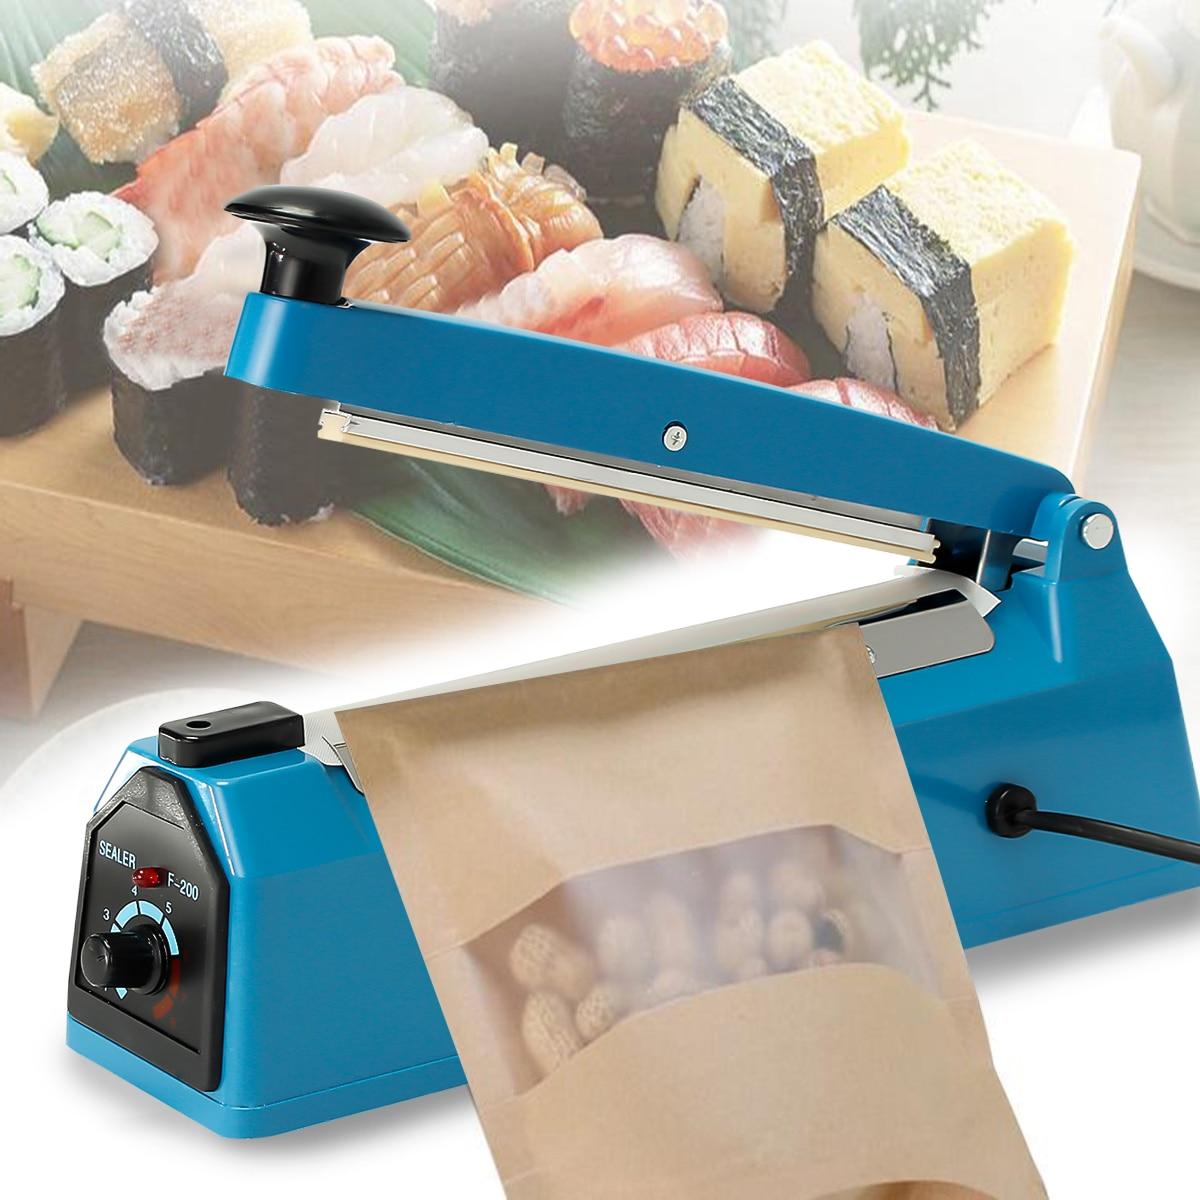 Impulse Heat Sealer Electric 200mm Plastic Poly PP PE Bag Hand Sealing Machine EU Plug for PE PP Bags Timer Settings 220v kitche